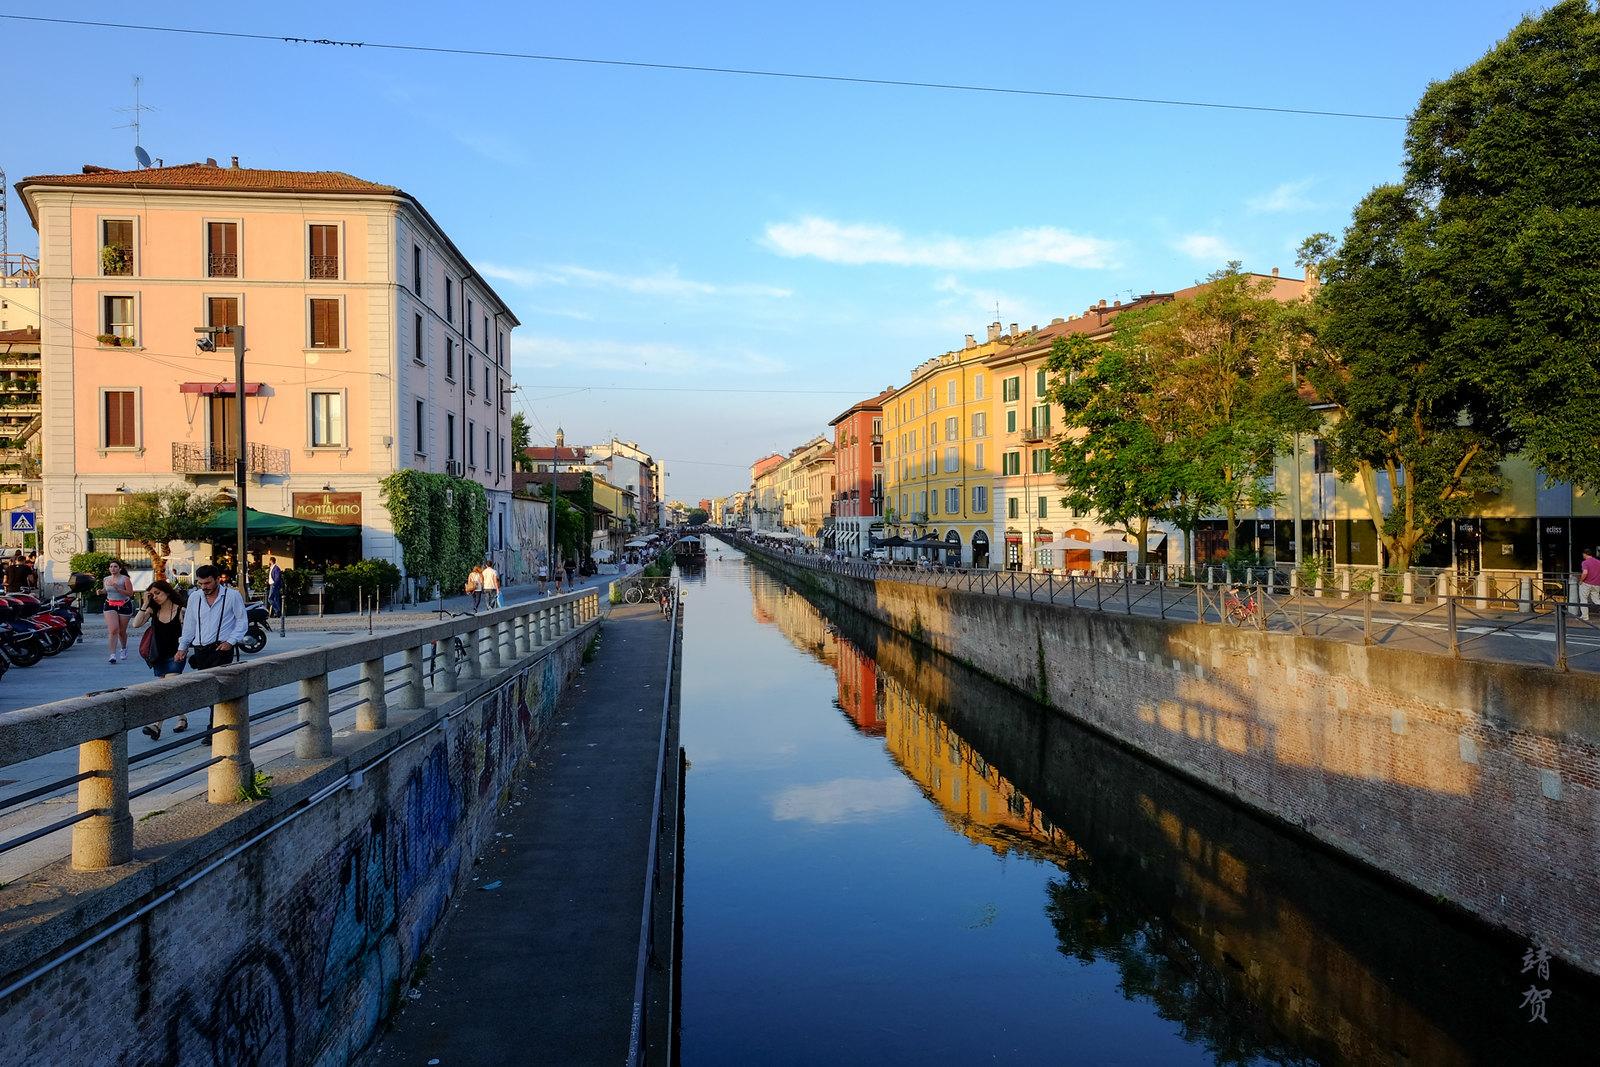 Canals in Navigli